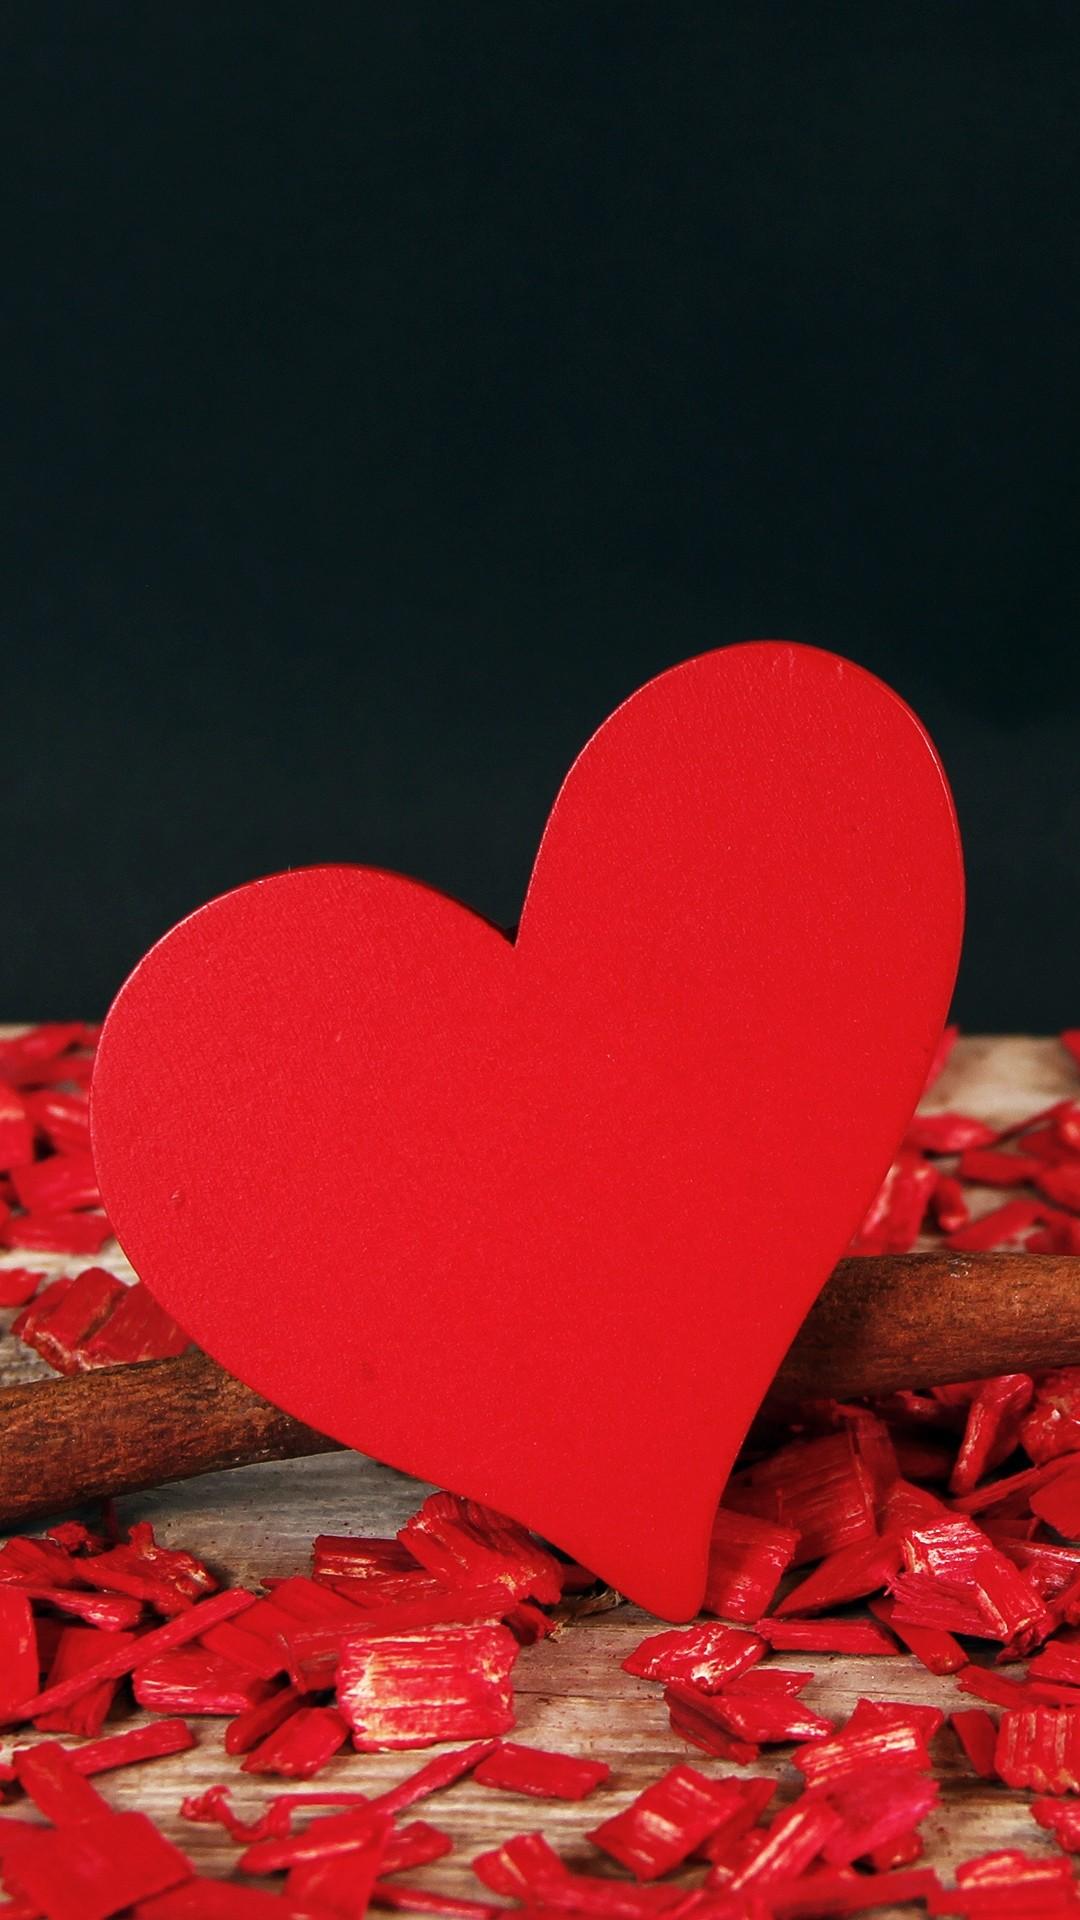 Valentines phone wallpaper hd